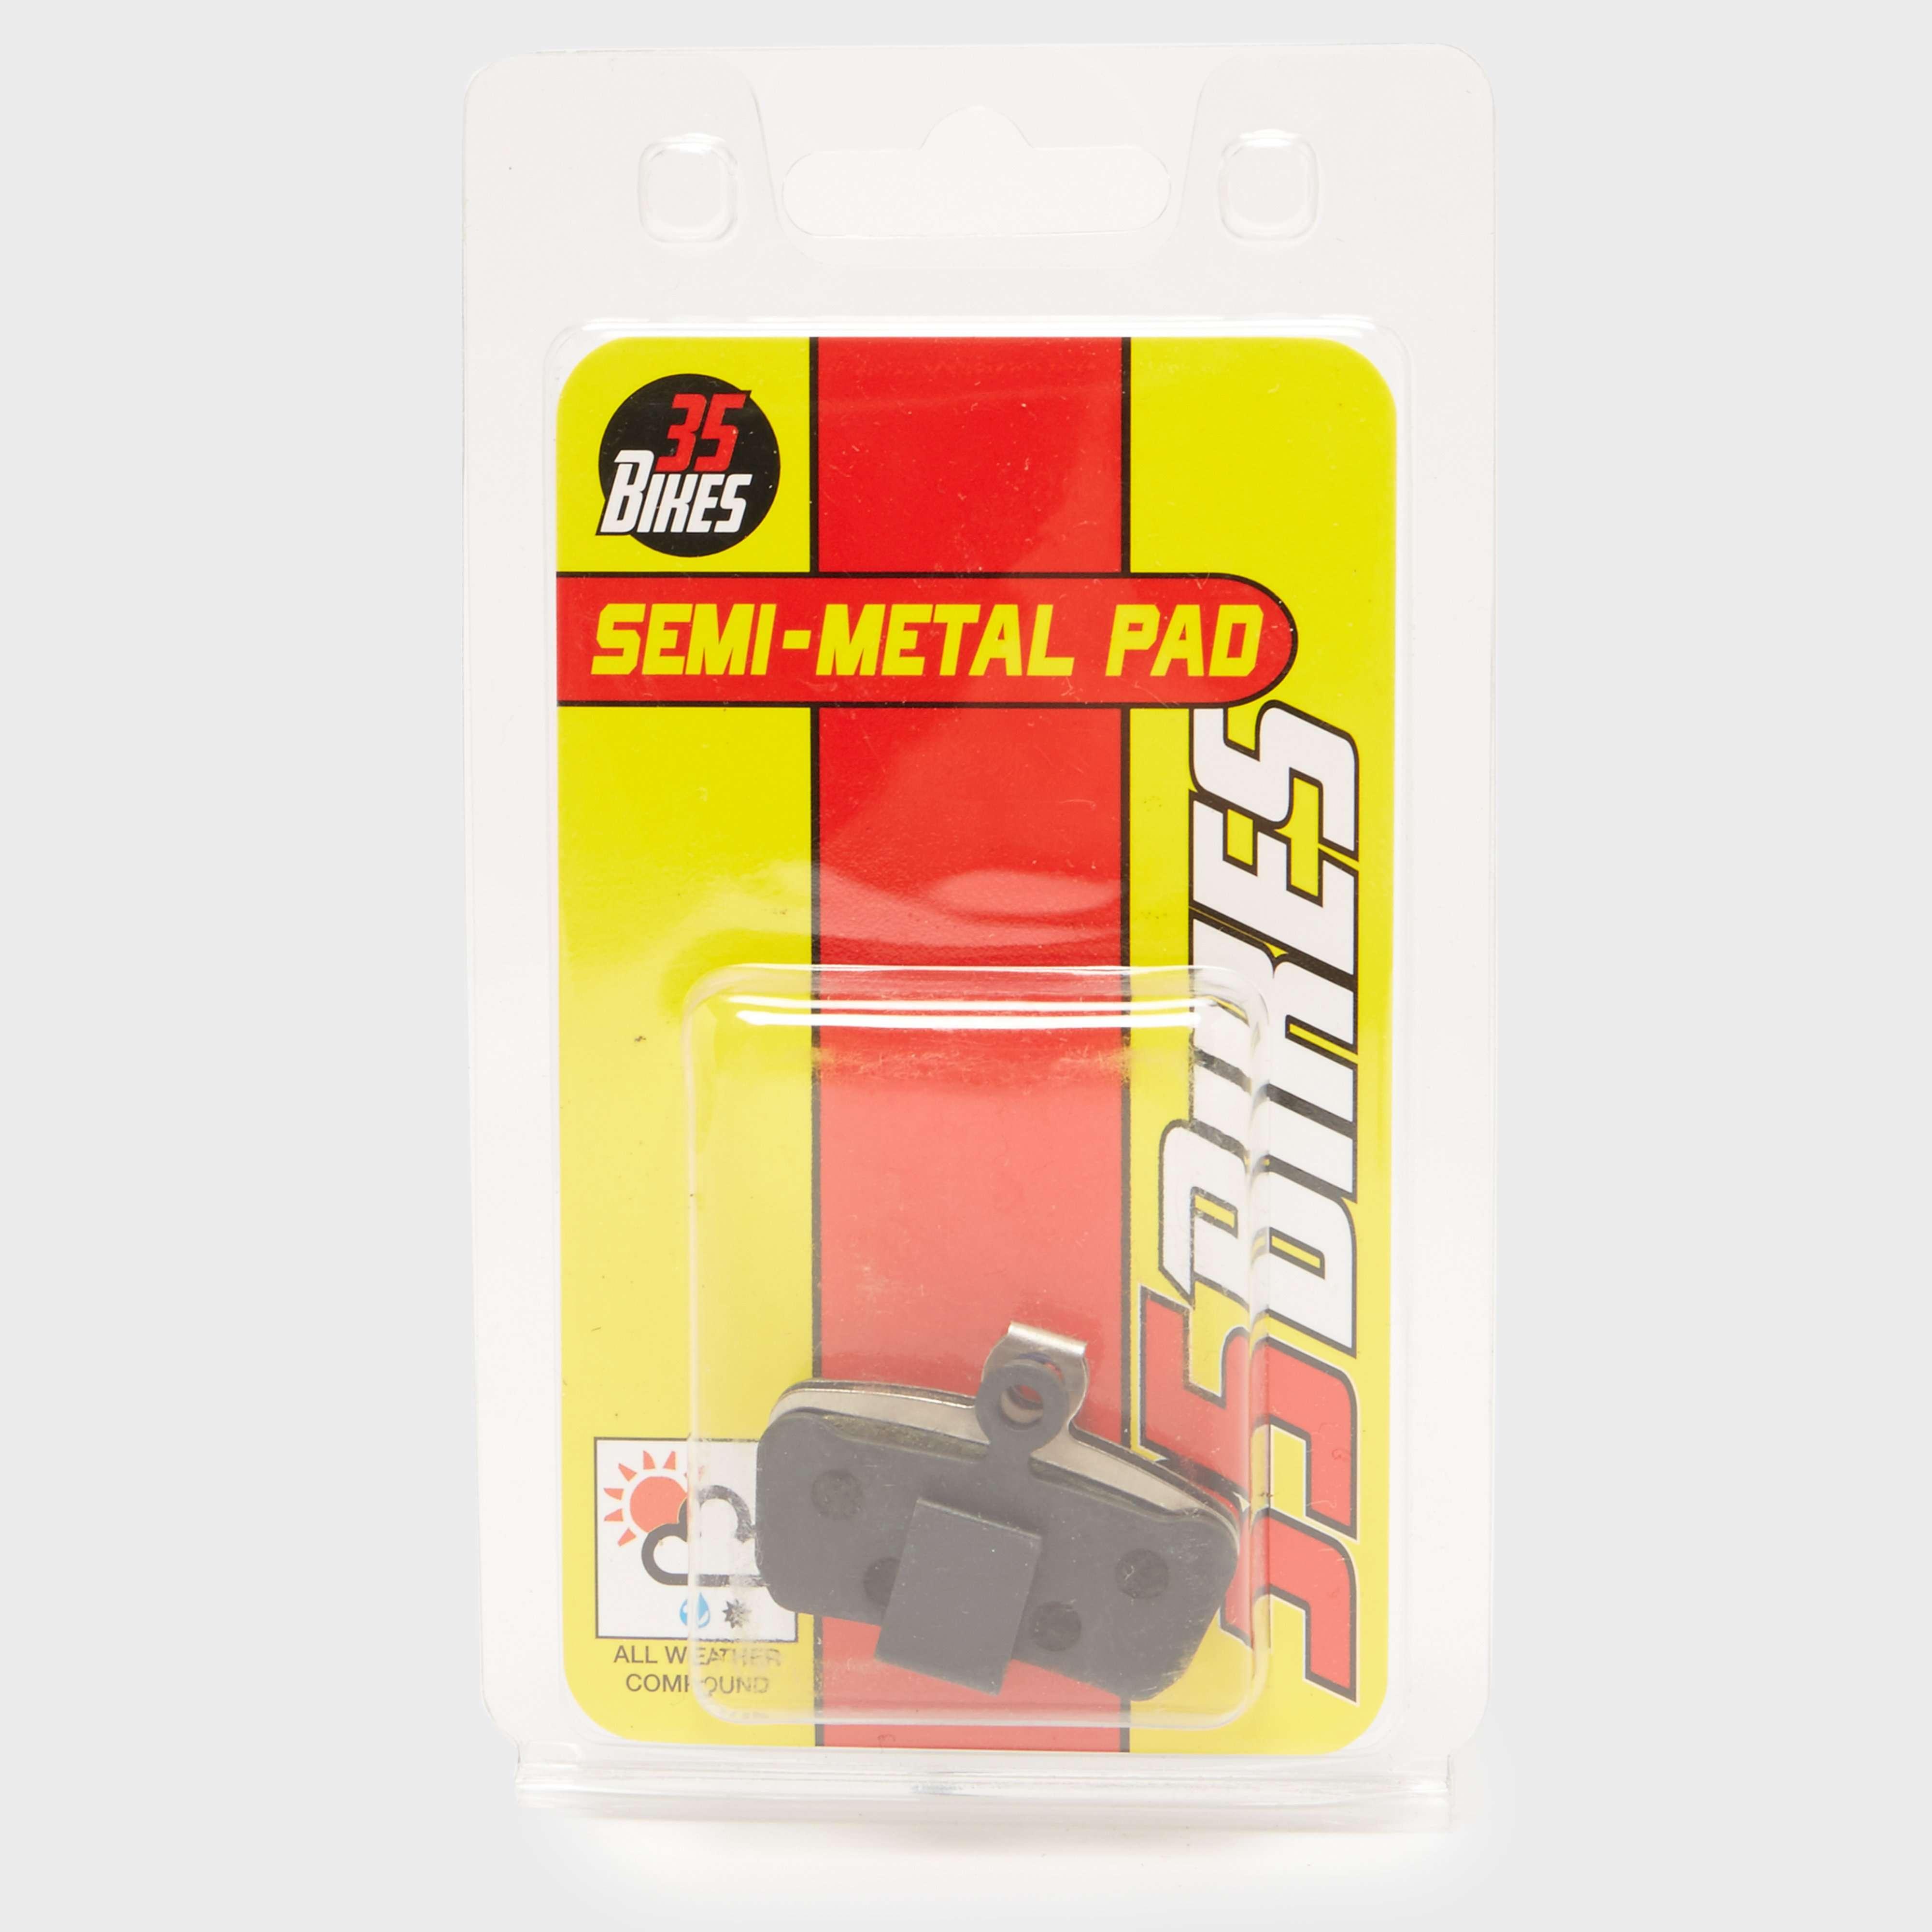 35 BIKES Shimano Avid Elixir, SRAM XX/XO Semi Metallic Brake Pads